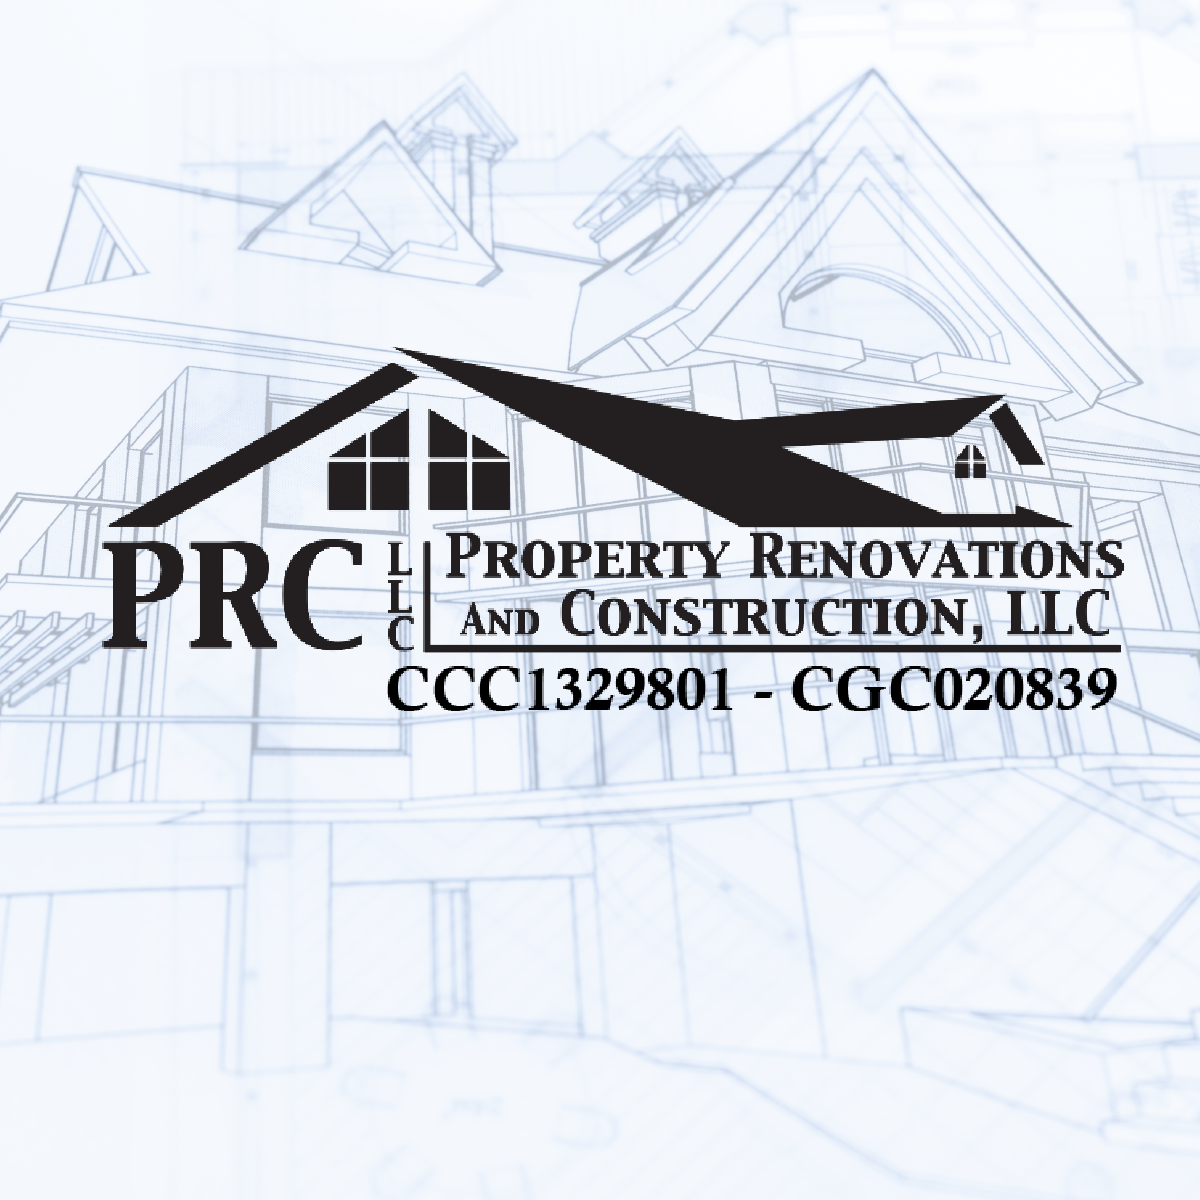 Property Renovations & Construction logo